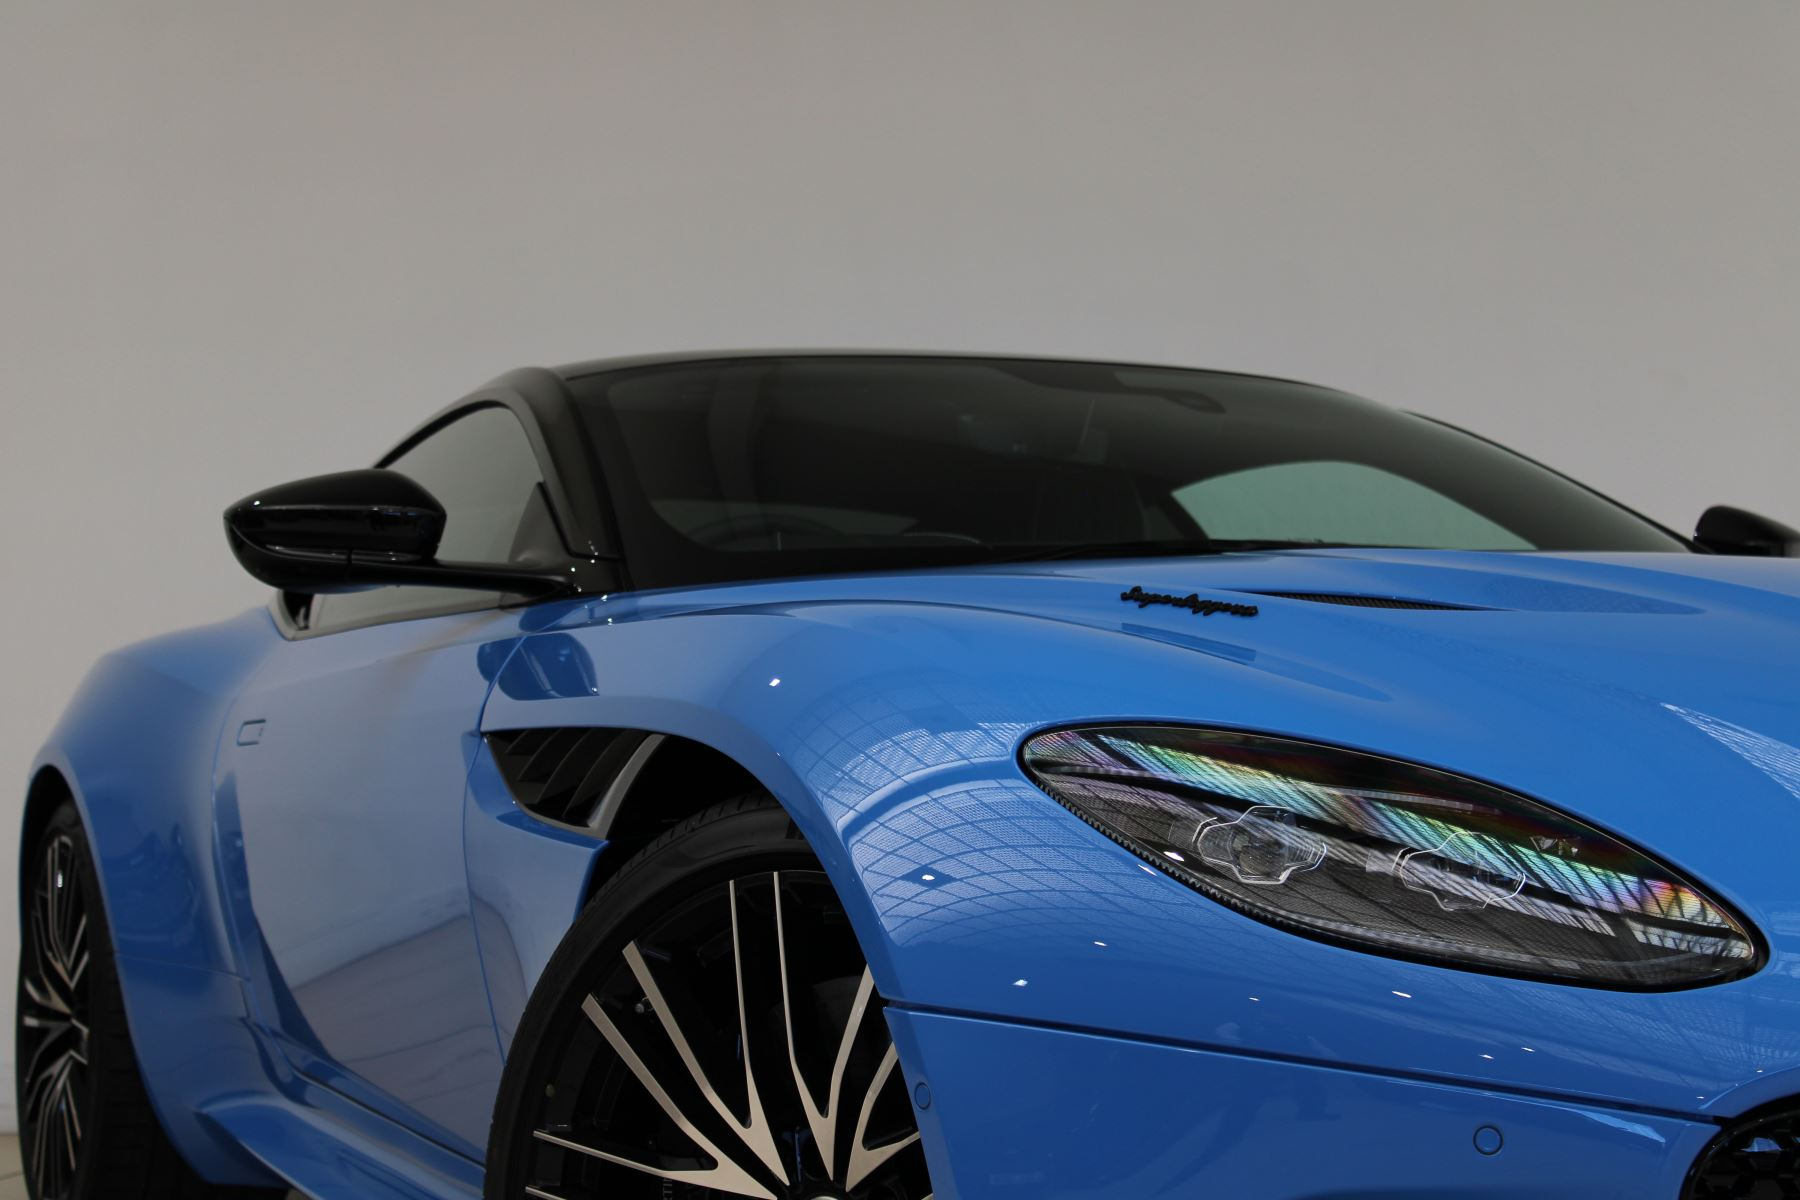 Aston Martin DBS V12 Superleggera Touchtronic Special Ceramic Blue - B&O image 6